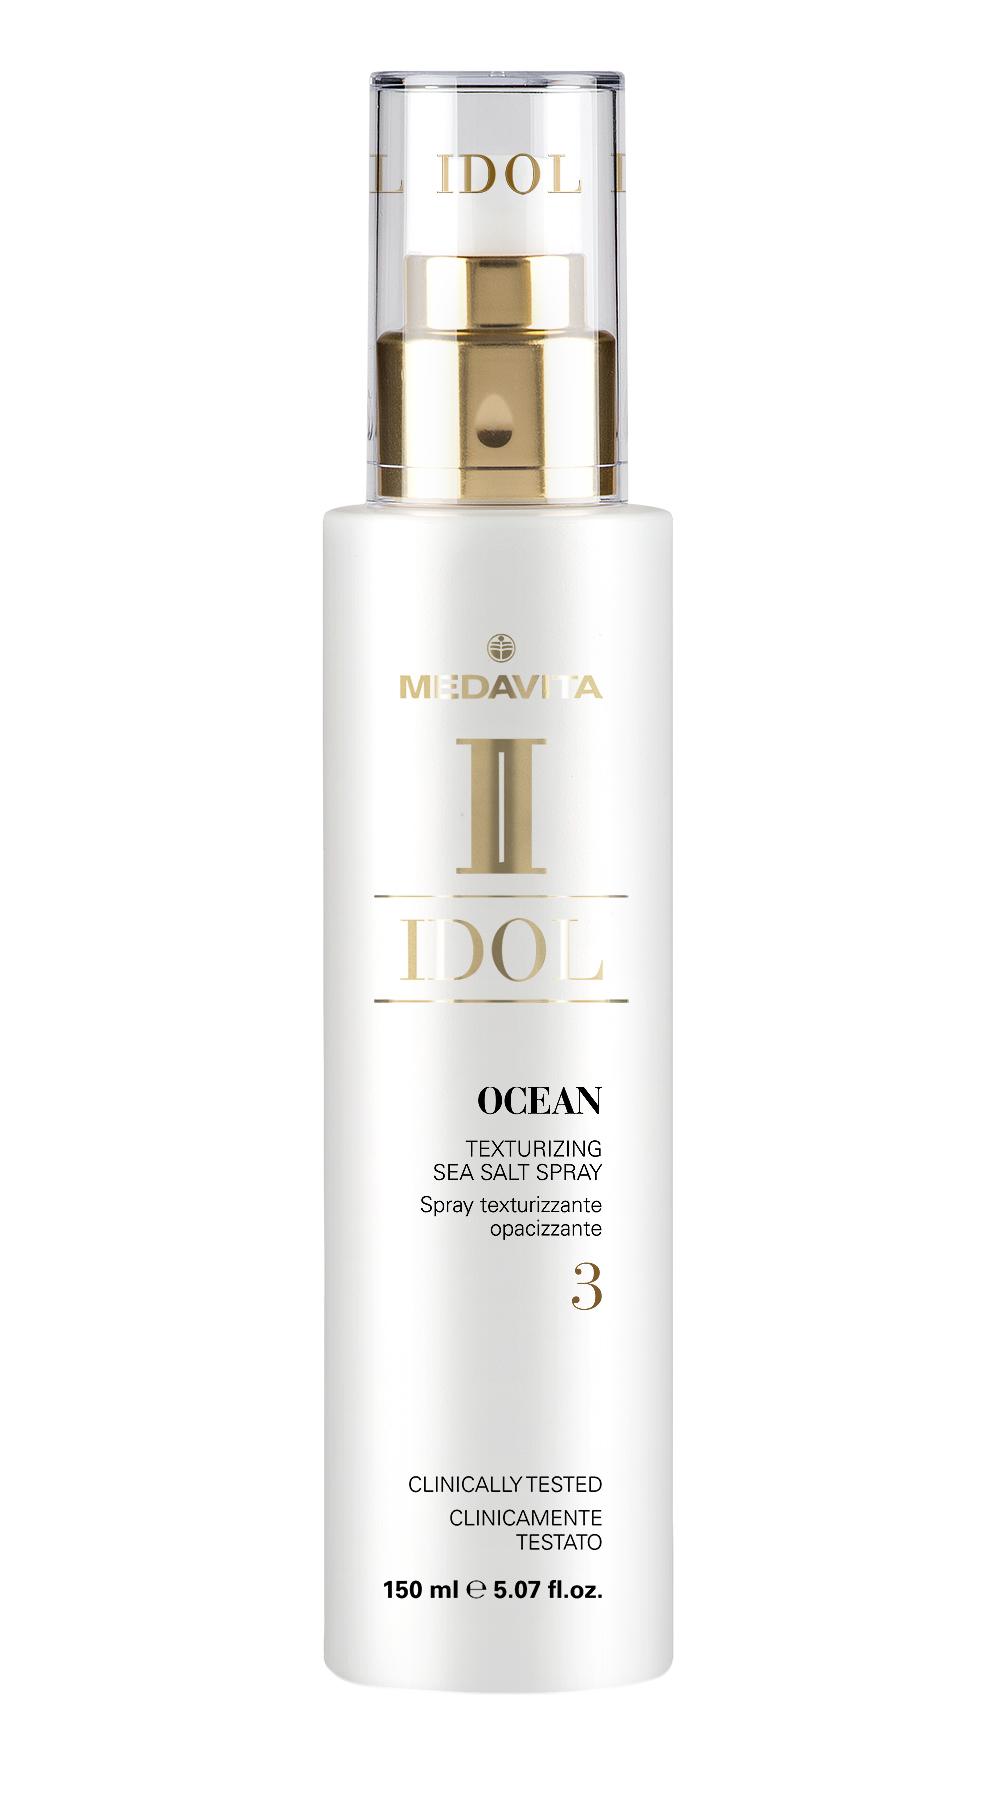 Ocean IDOL 150ml DEF-klein